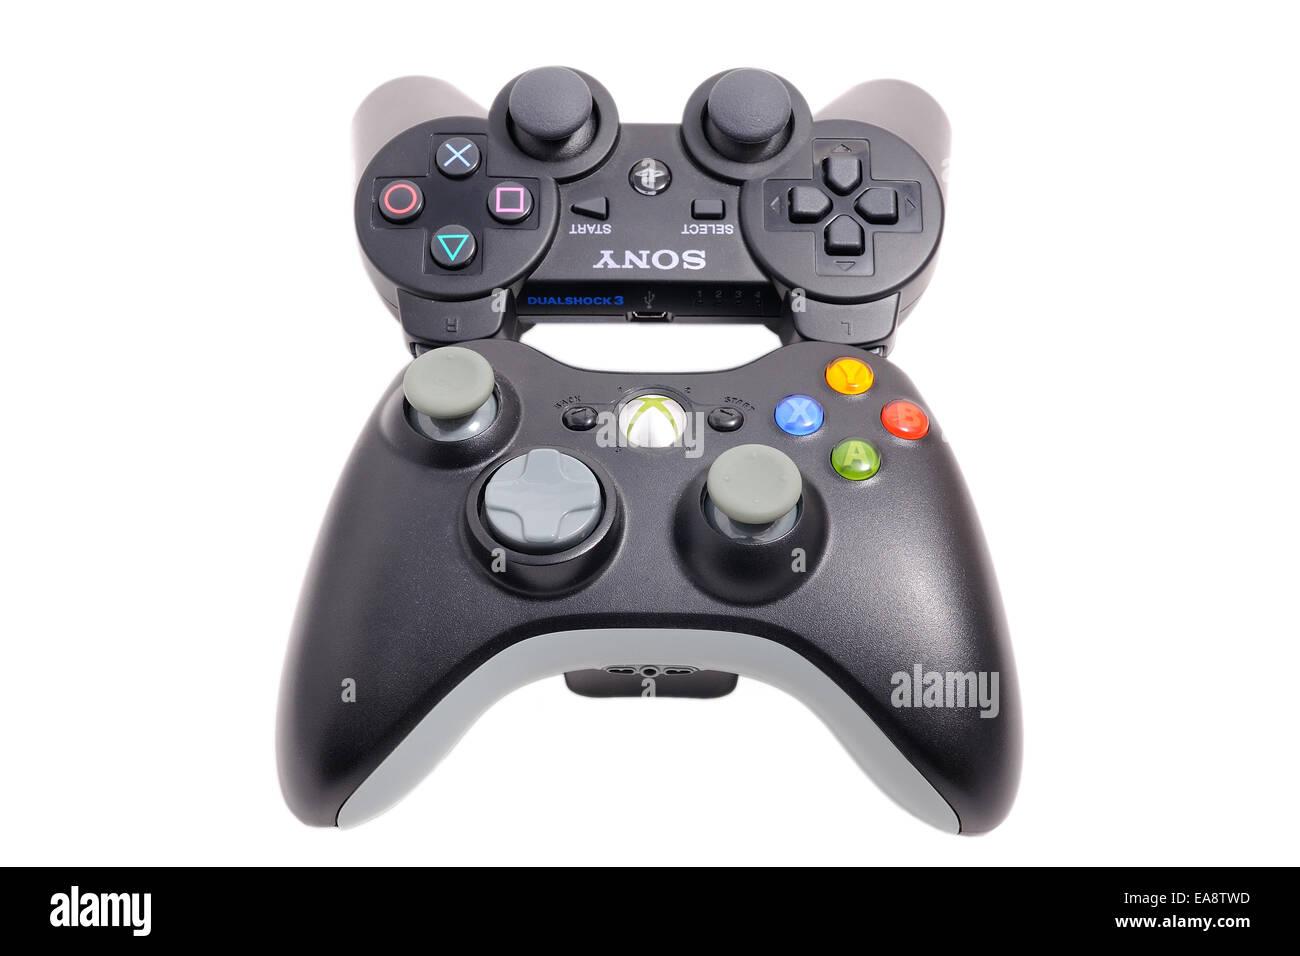 Xbox One Controller Stockfotos & Xbox One Controller Bilder - Alamy